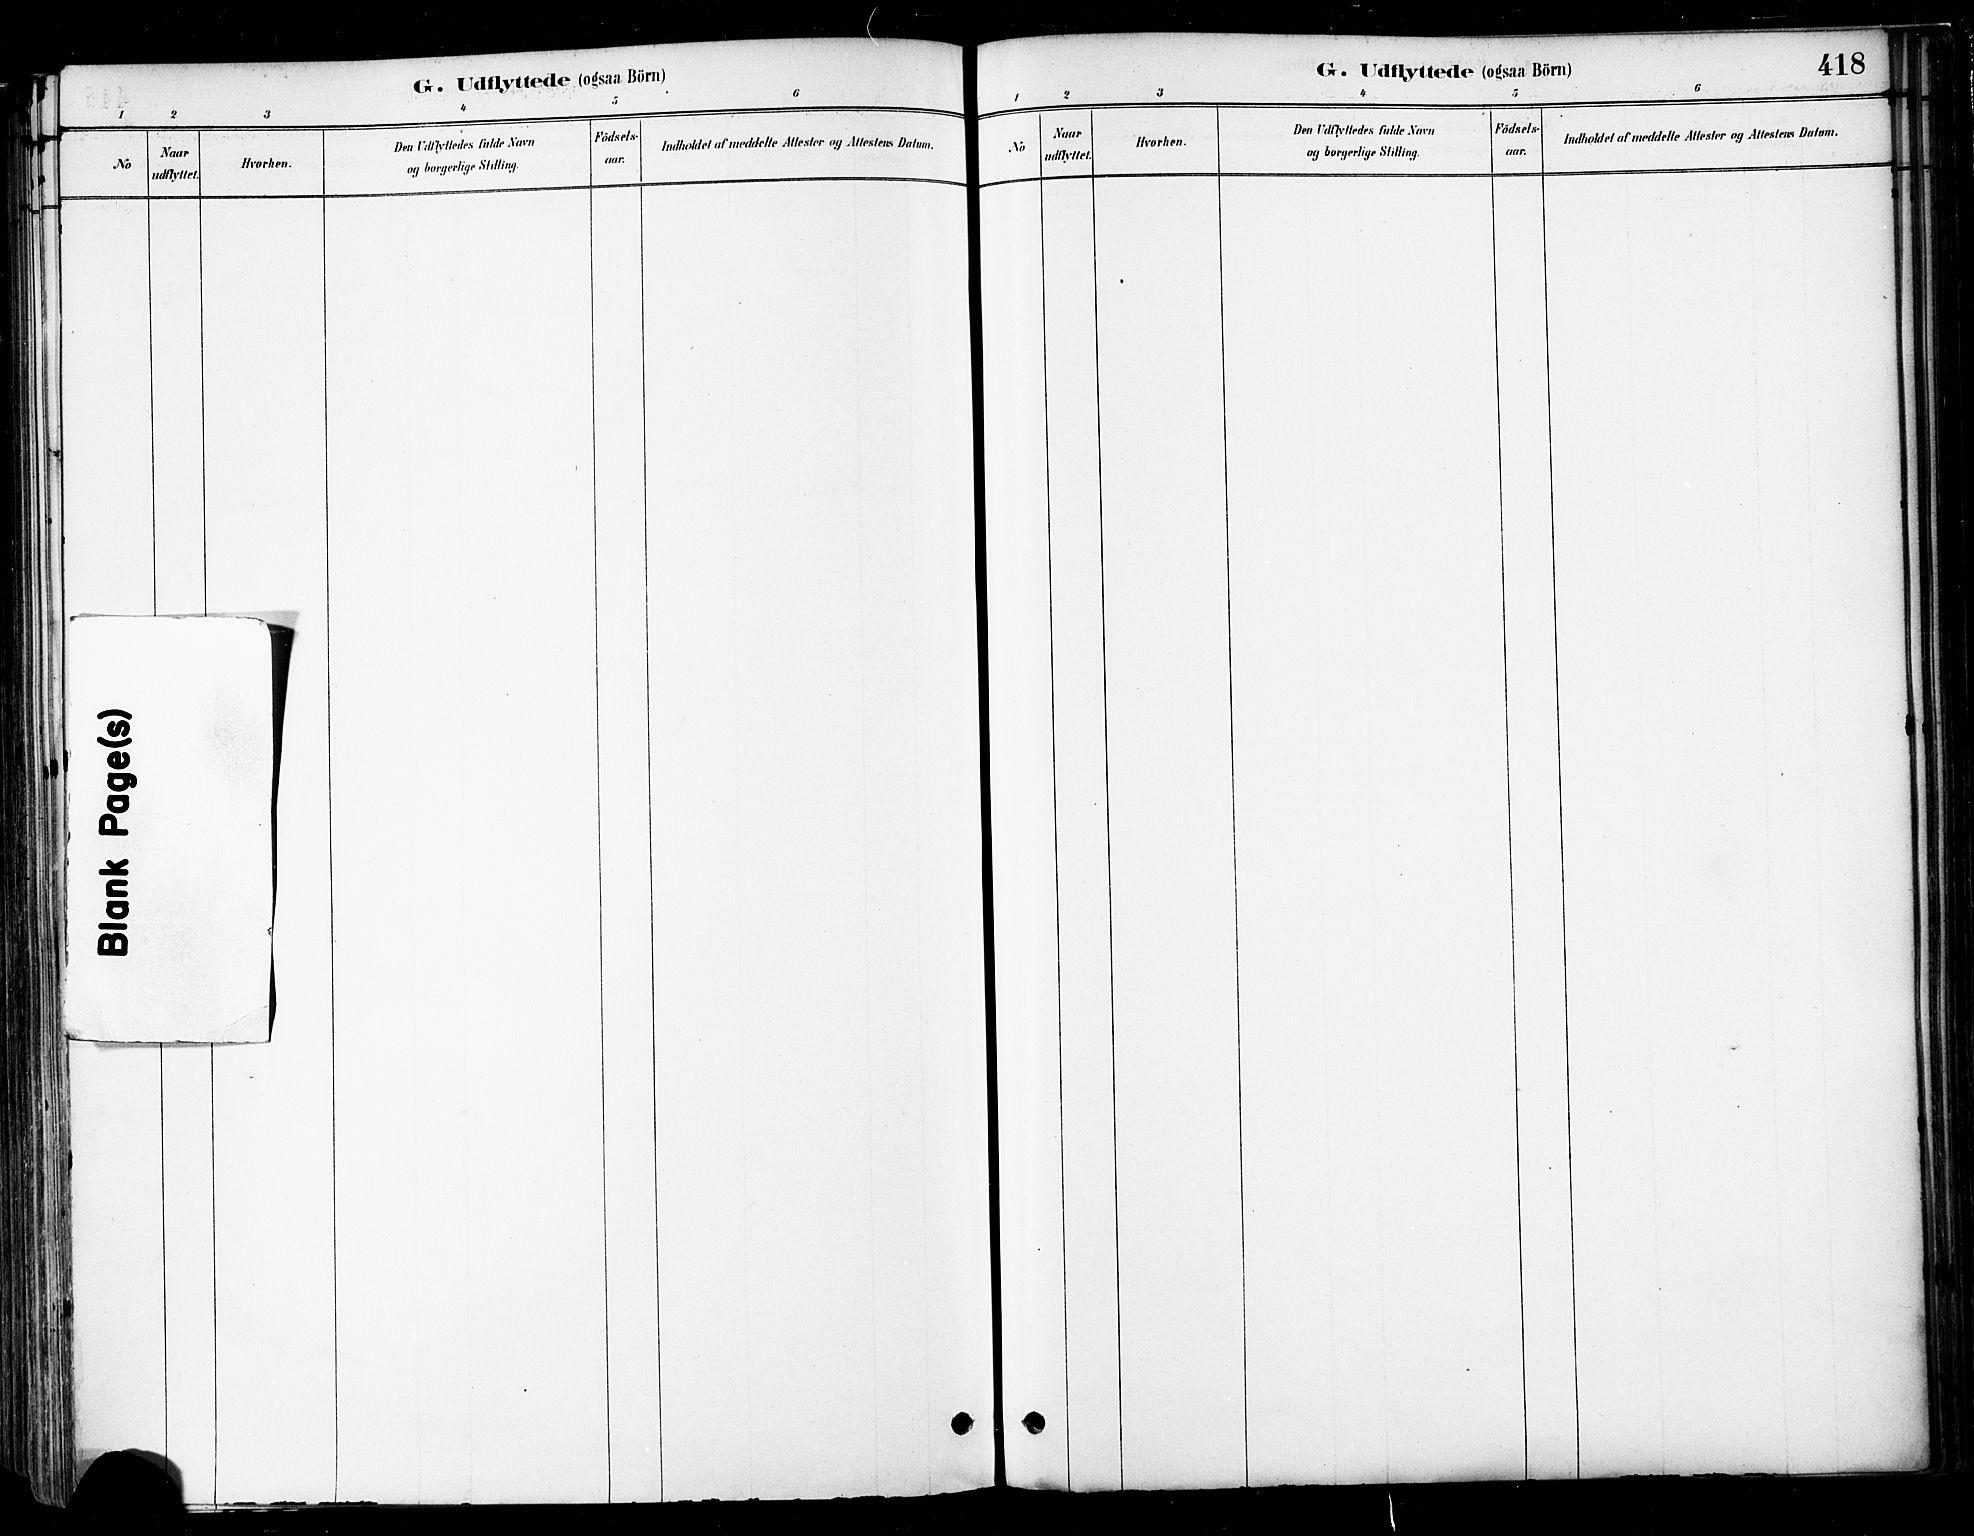 SAT, Ministerialprotokoller, klokkerbøker og fødselsregistre - Nordland, 802/L0054: Ministerialbok nr. 802A01, 1879-1893, s. 418